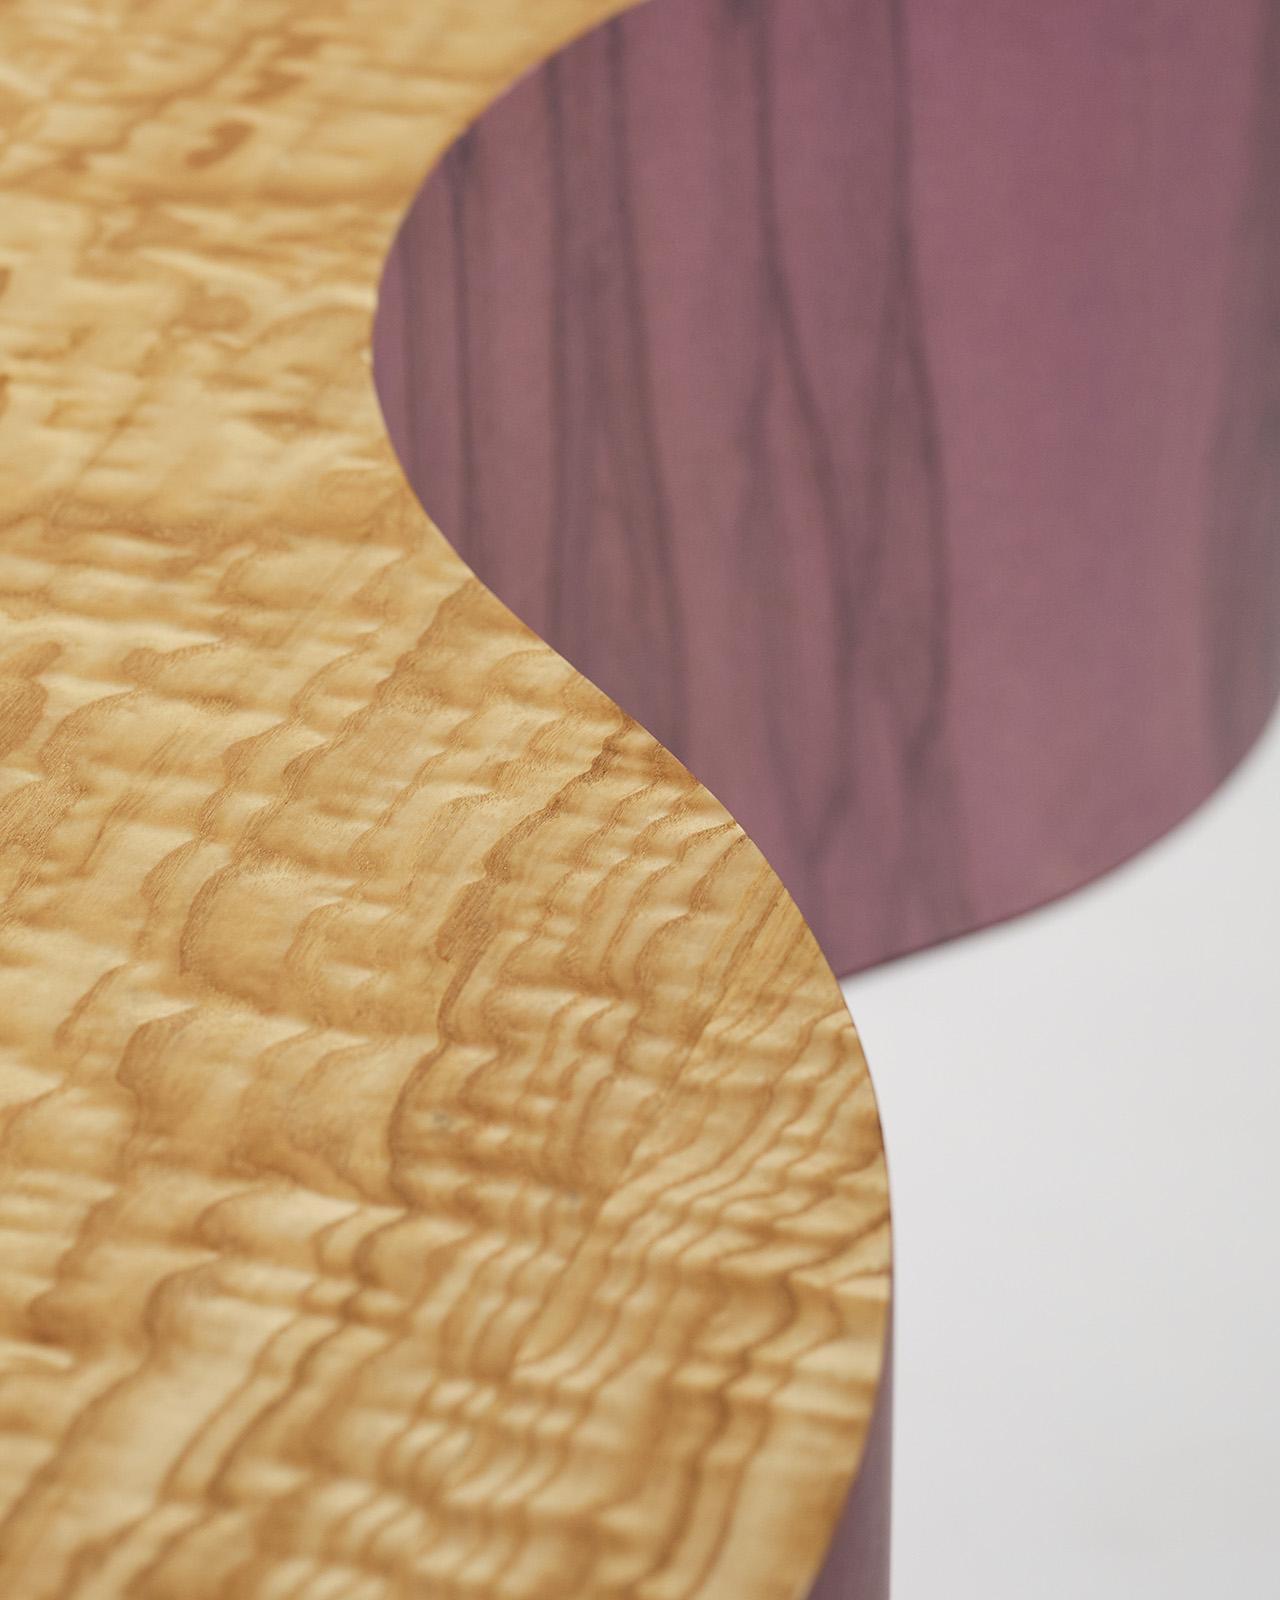 purple wood coffee table detail